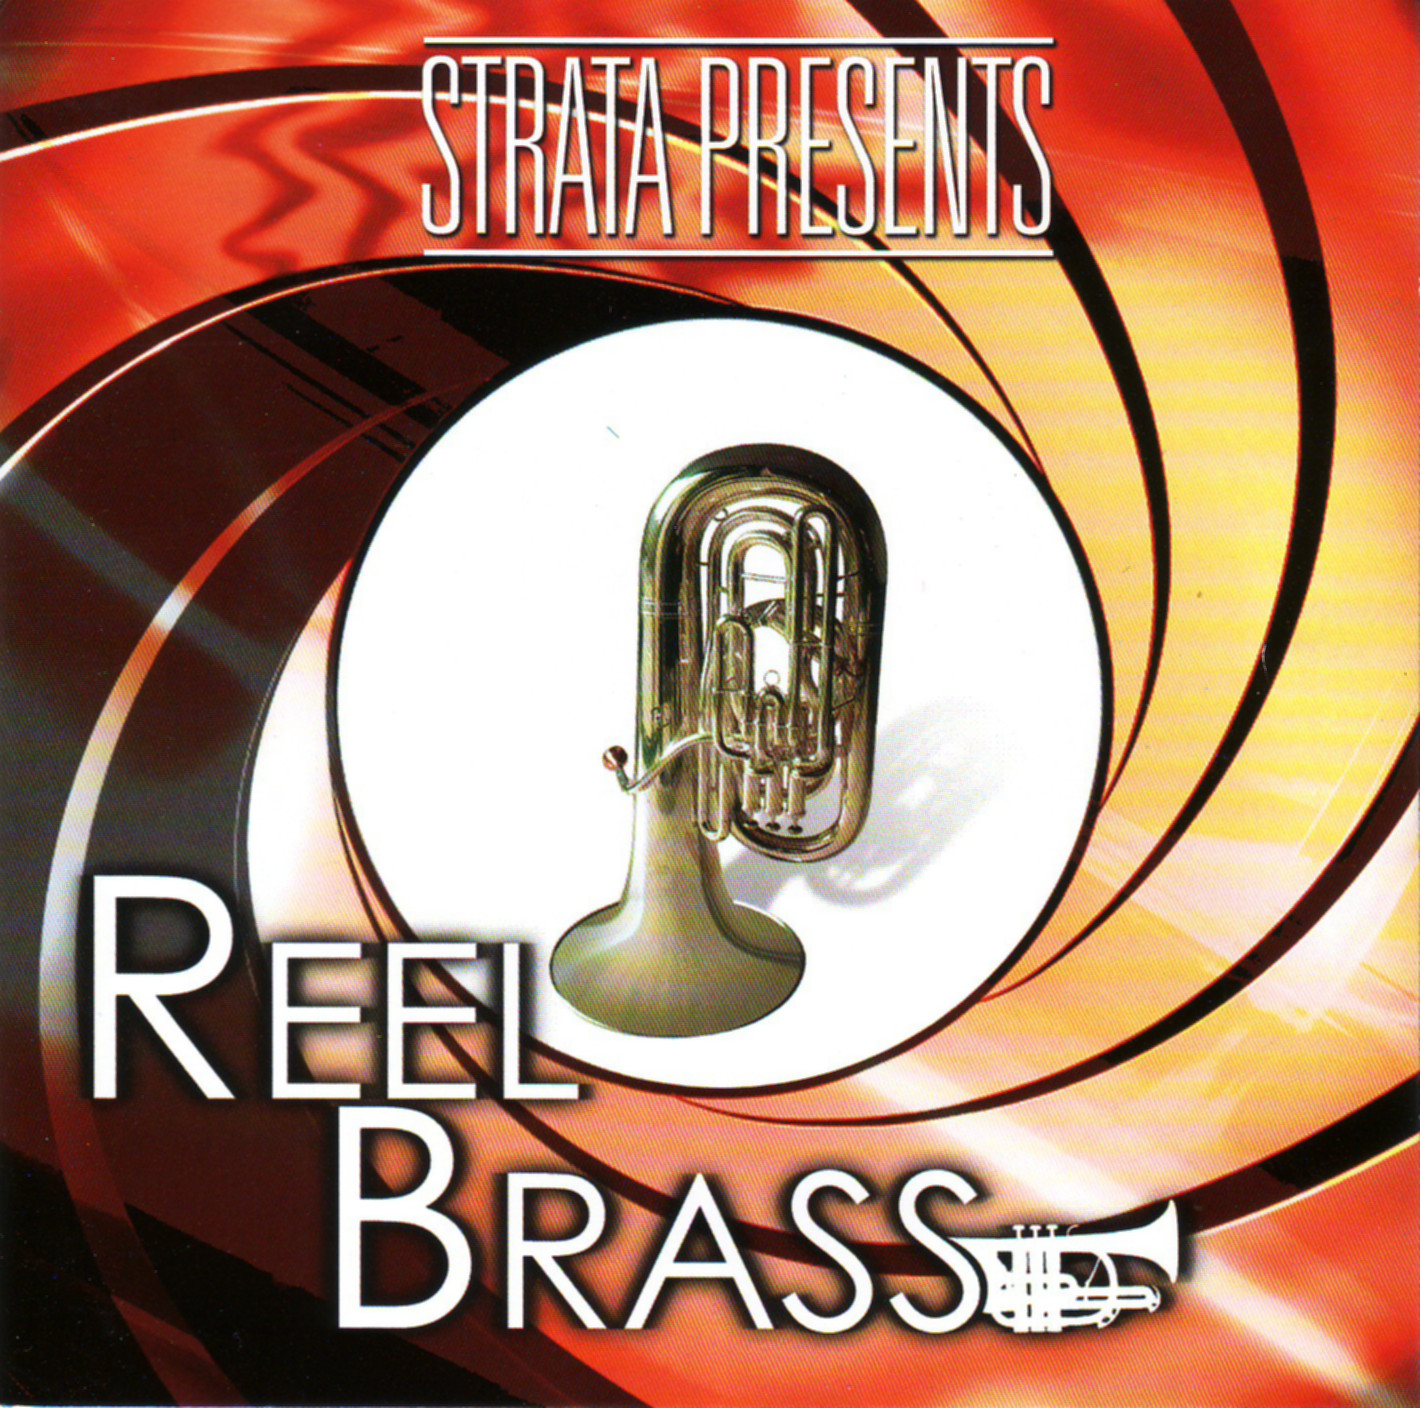 Reel Brass